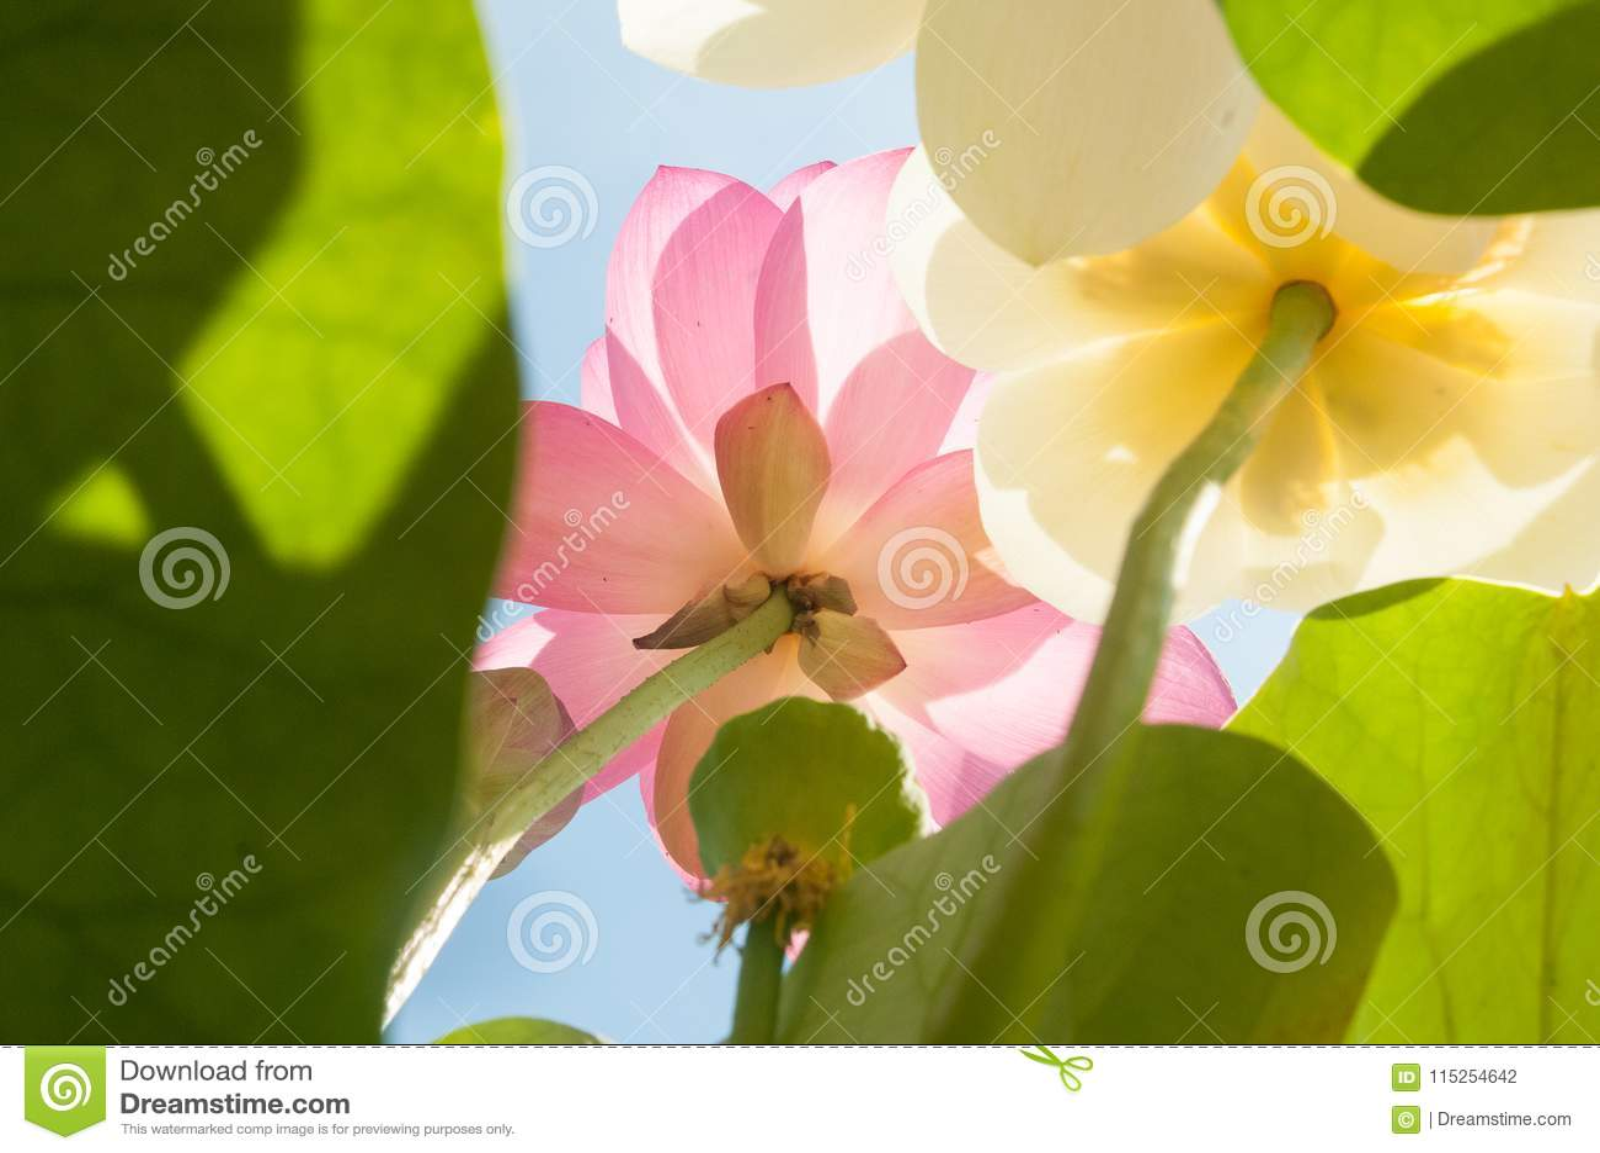 Closeup White And Pink Flower Of Lotus Nelumbo Nucifera Stock Photo